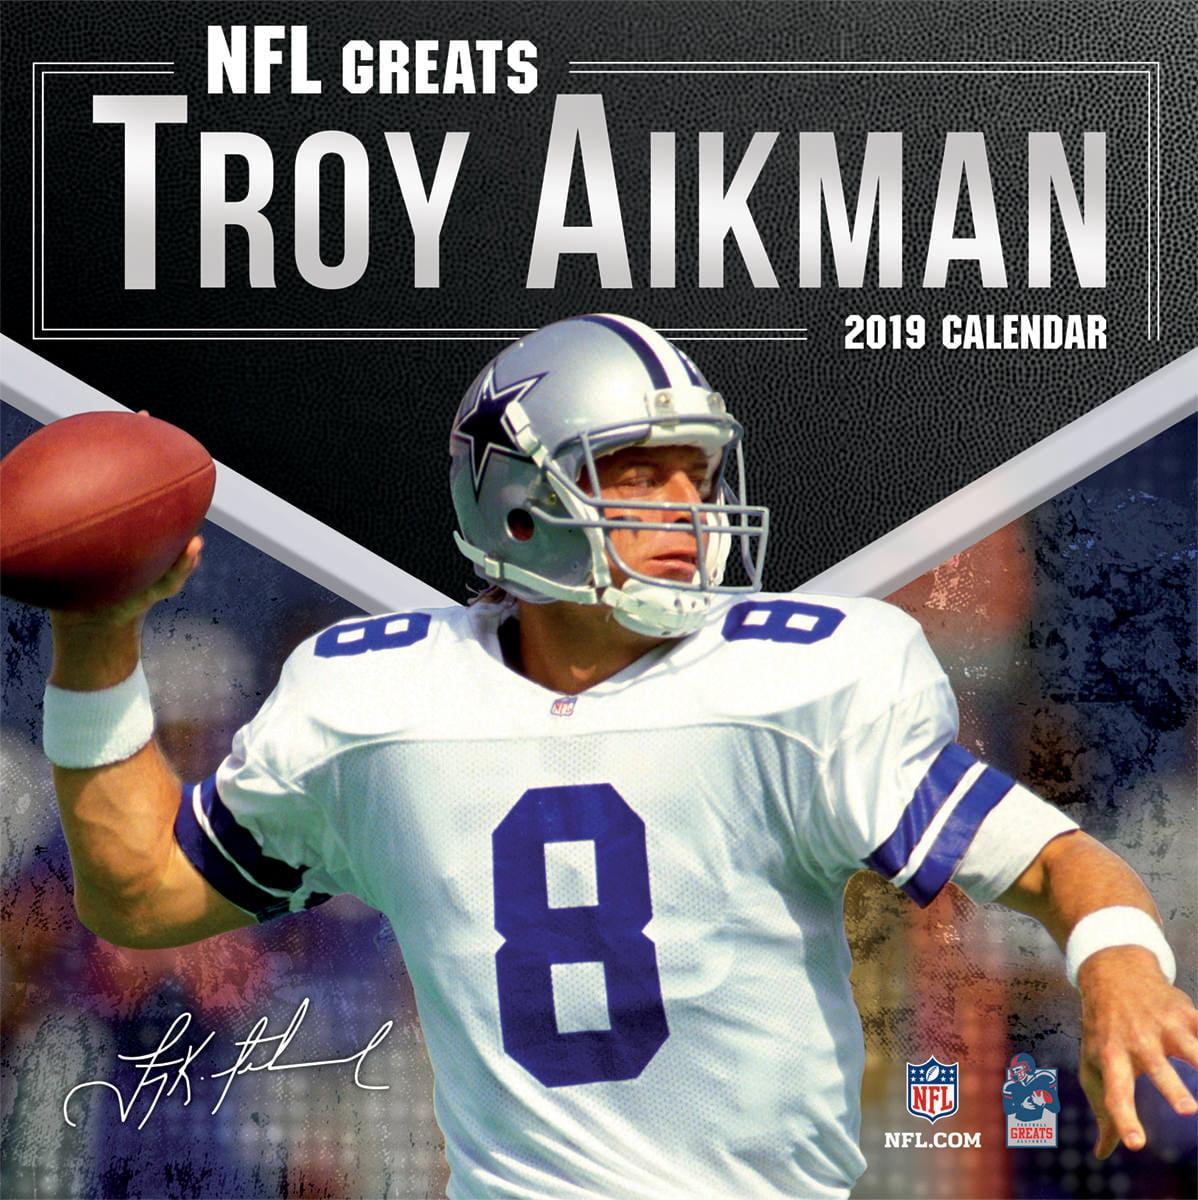 2019 12X12 GREATS WALL CALENDAR, NFL GREATS TROY AIKMAN